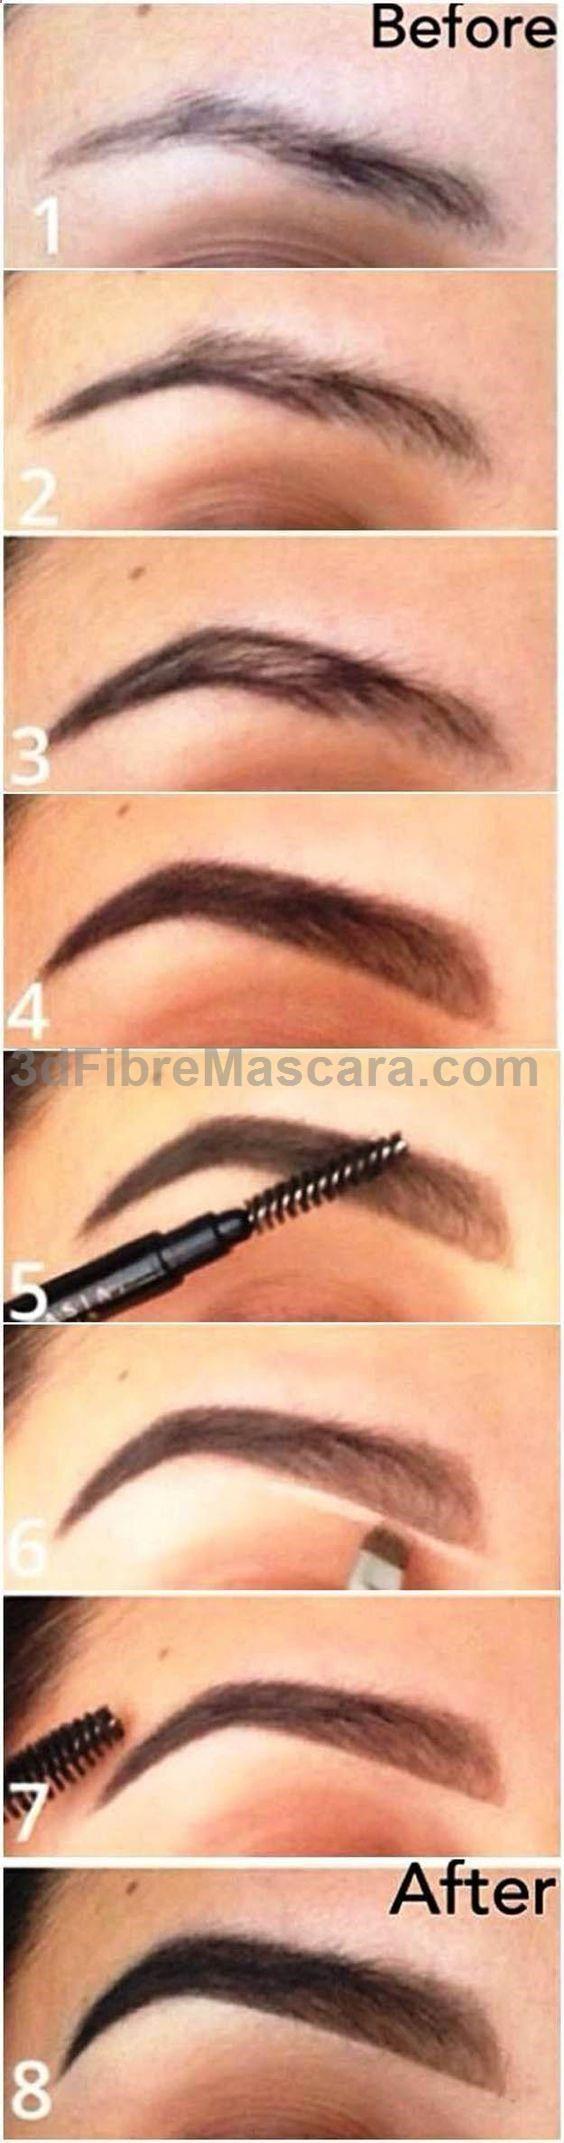 Eyebrow Makeup Tutorials for Beginners by Makeup Tutorials at makeuptutorials.c...: